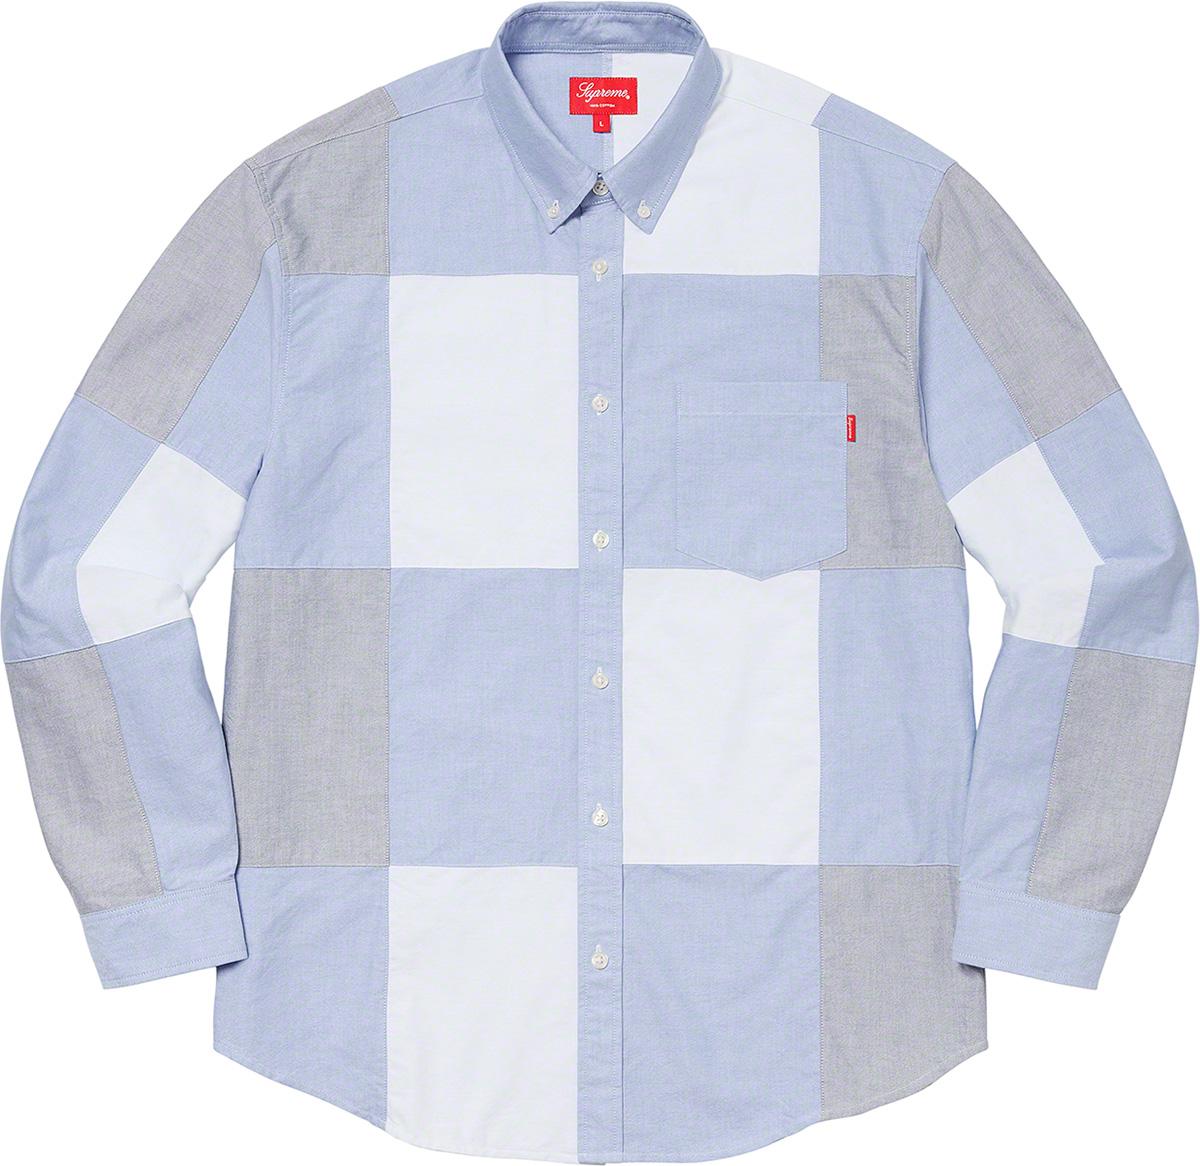 Supreme 2020fw Patchwork Oxford Shirt シュプリーム パッチワーク シャツ